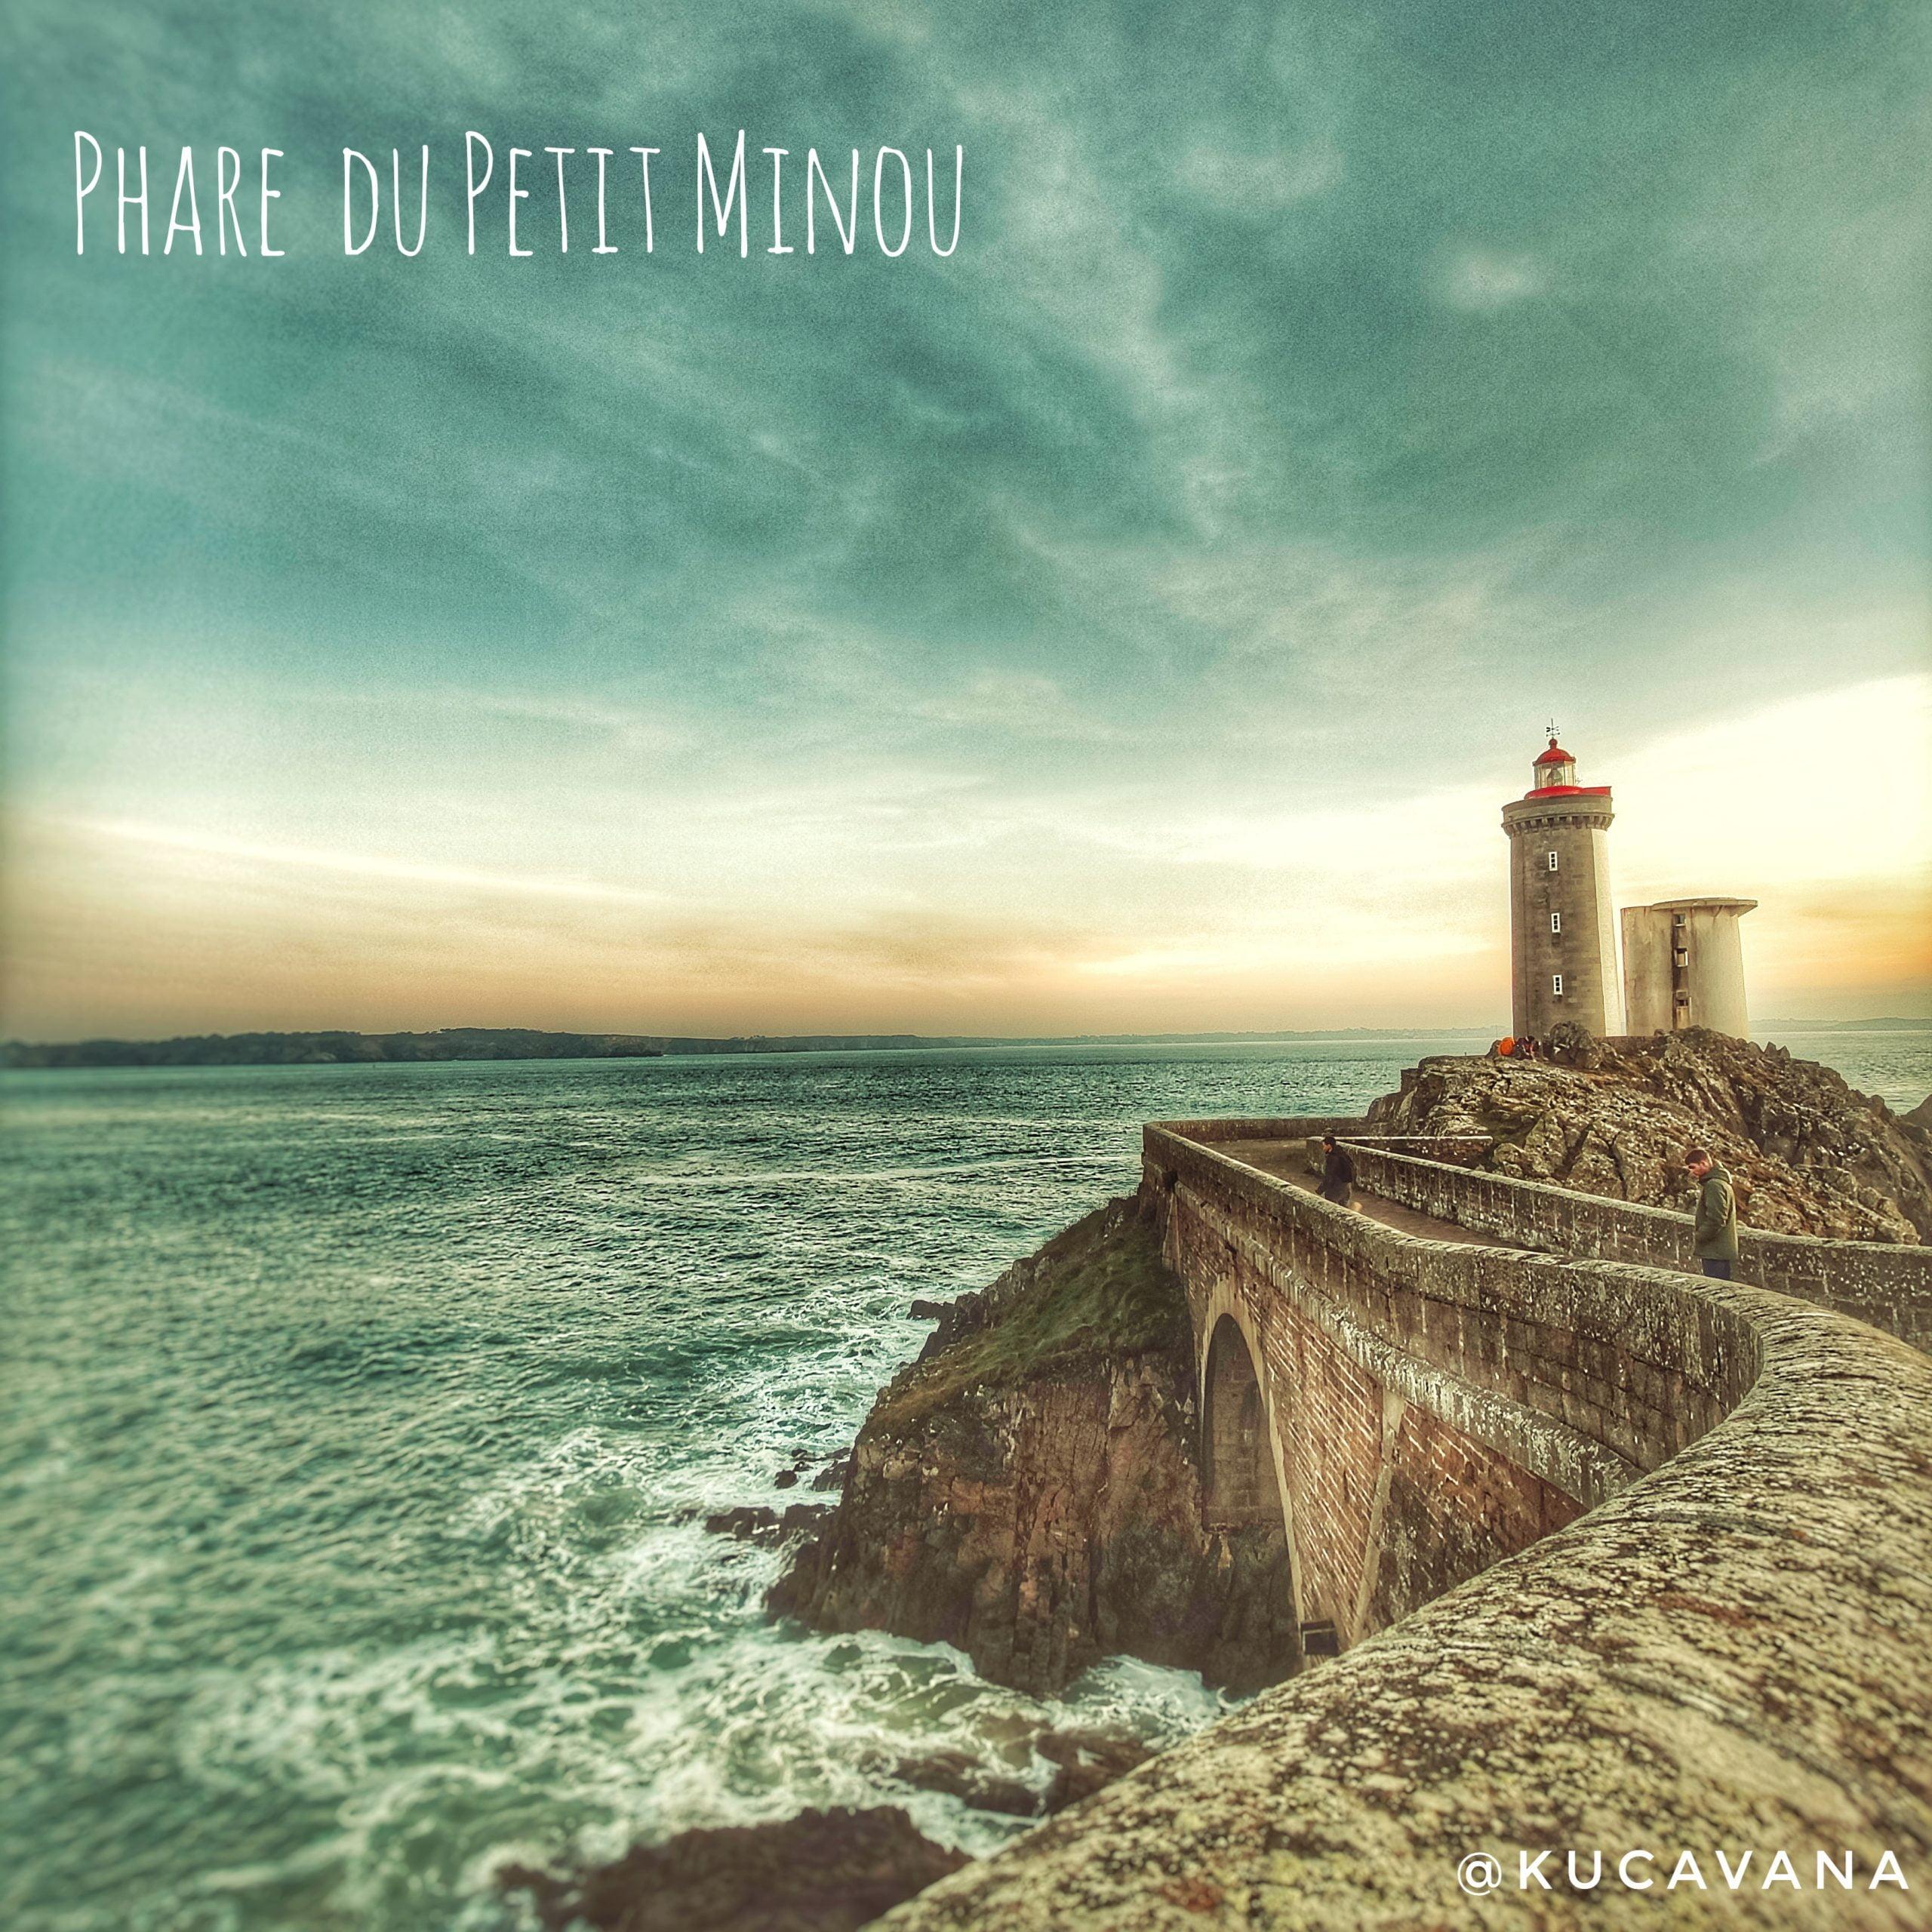 Le Petit Minou, phare de Bretagne française